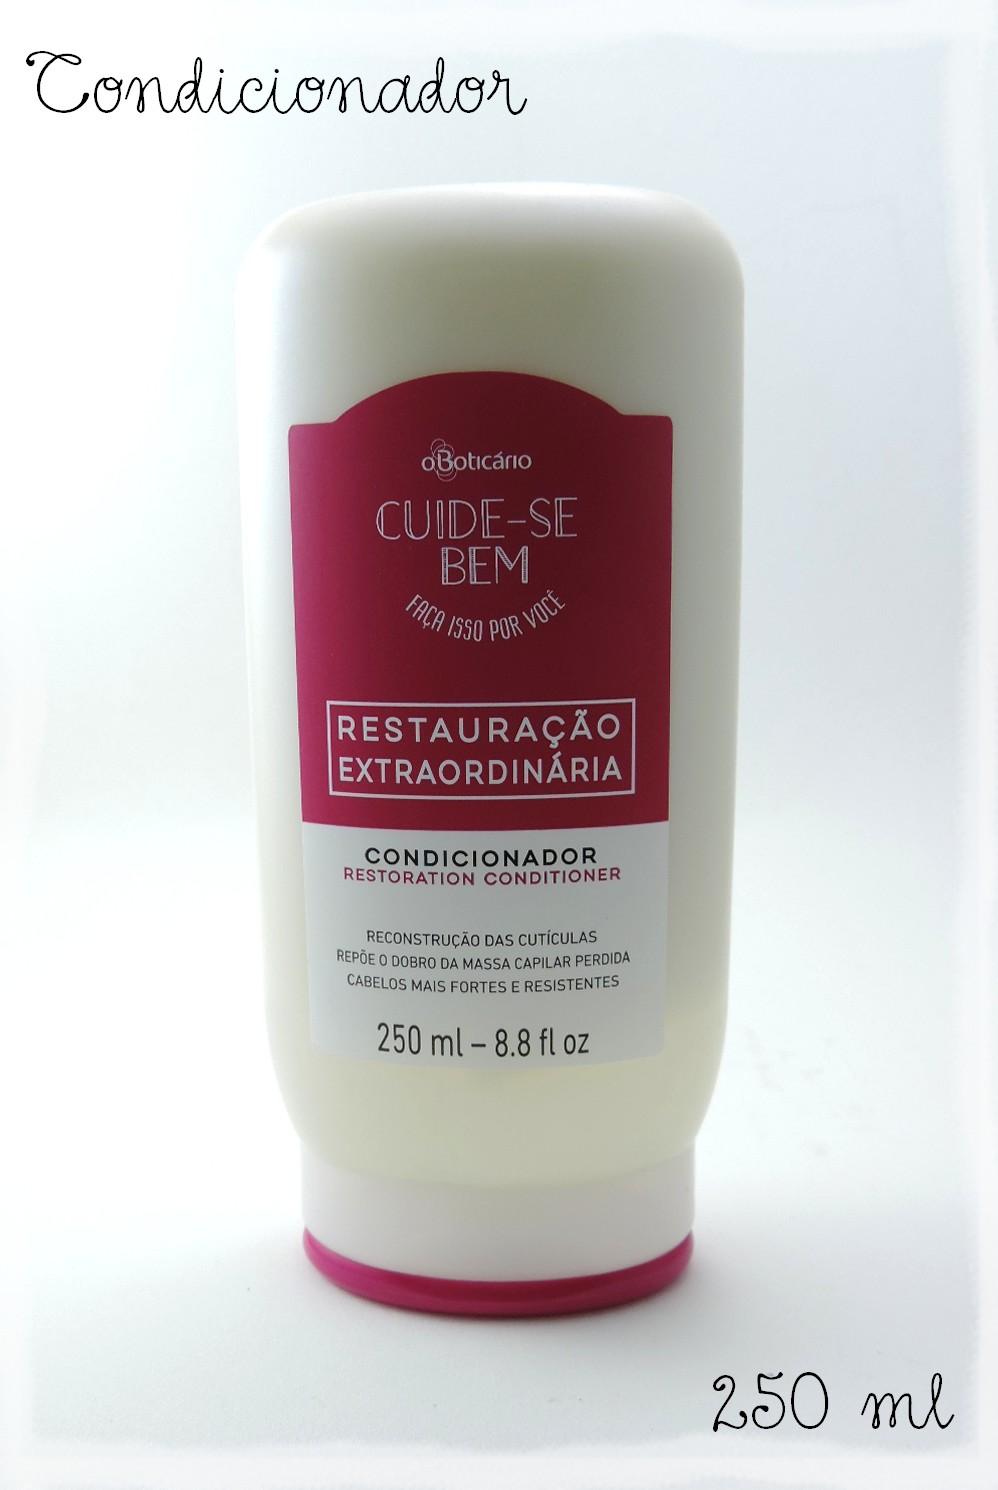 Boticario Cuide-se Bem Shampoo Hidratante 250 Ml hidratacao Imediata